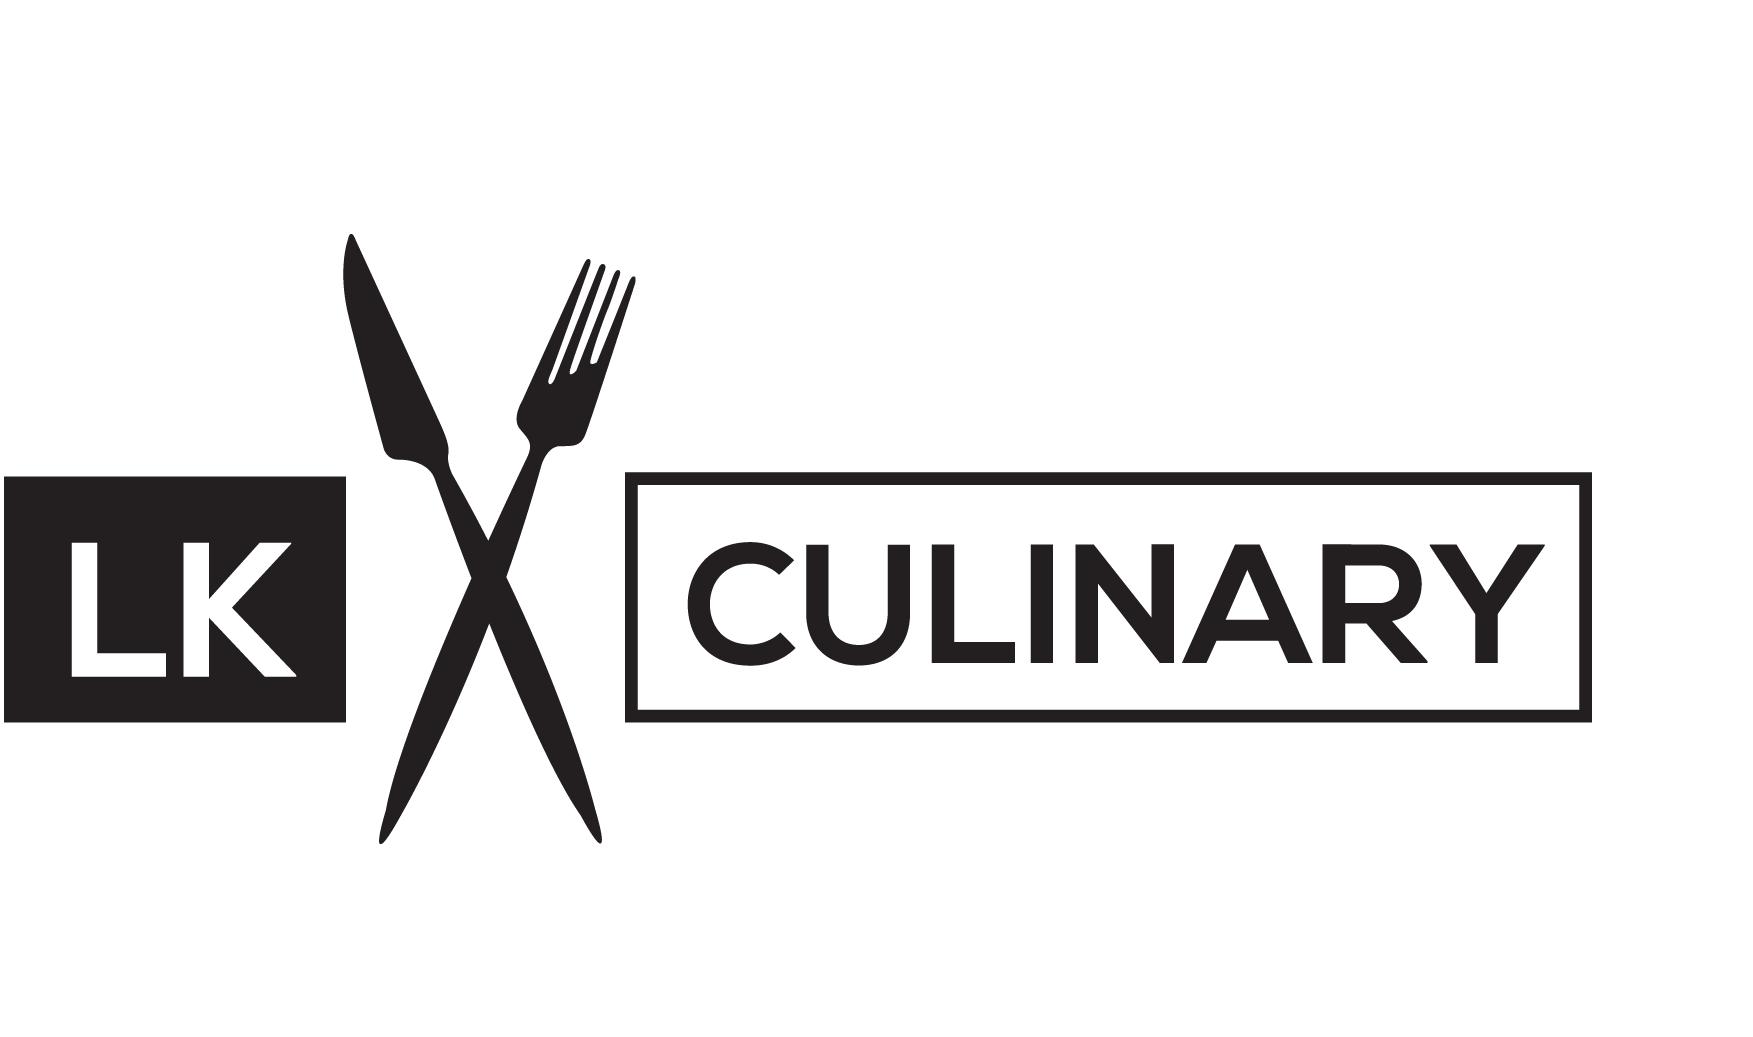 LK Culinary